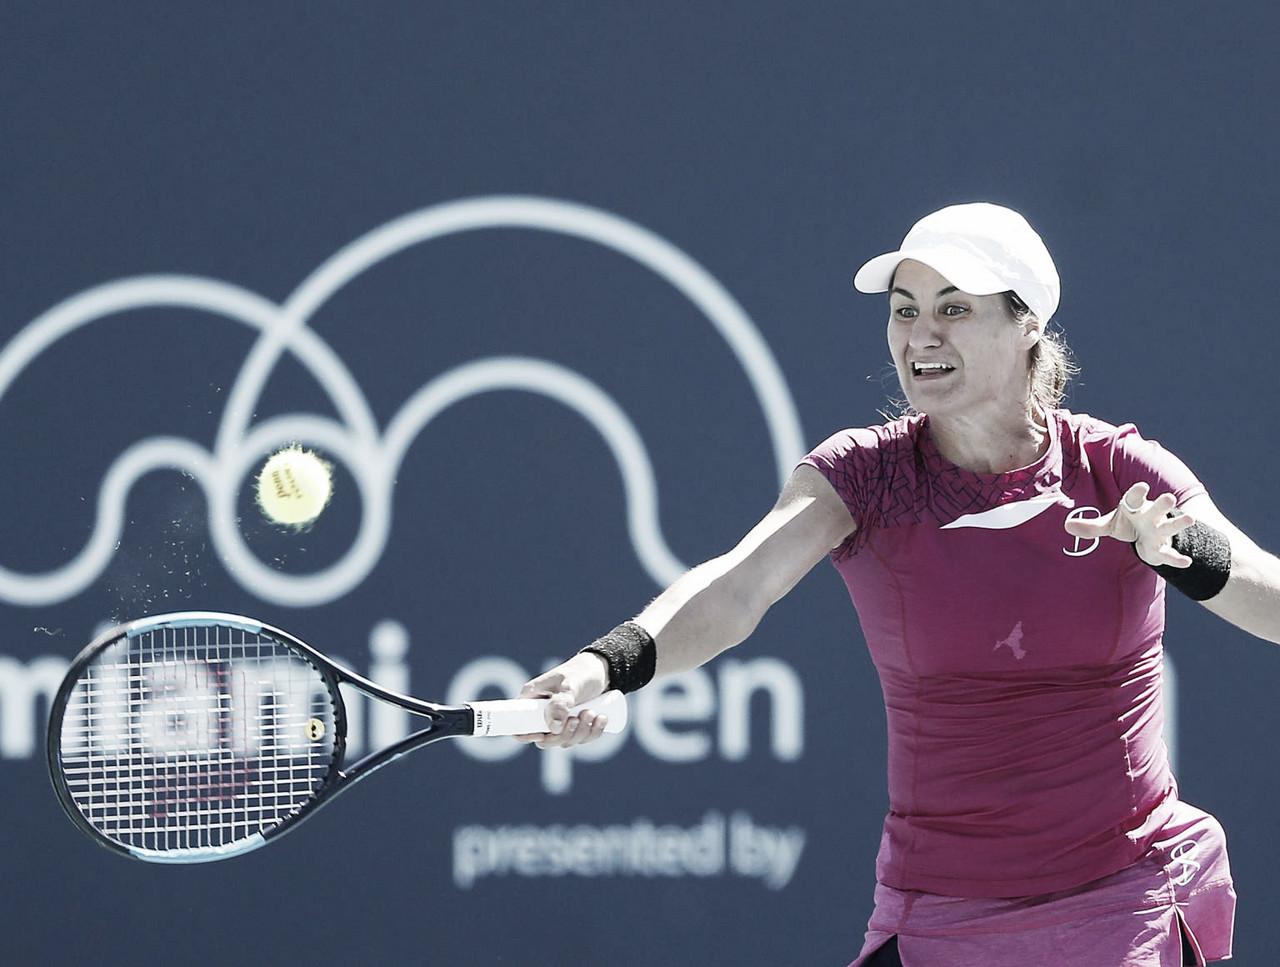 Niculescu surpreende Muguruza no WTA de Miami e avança para enfrentar Wozniacki